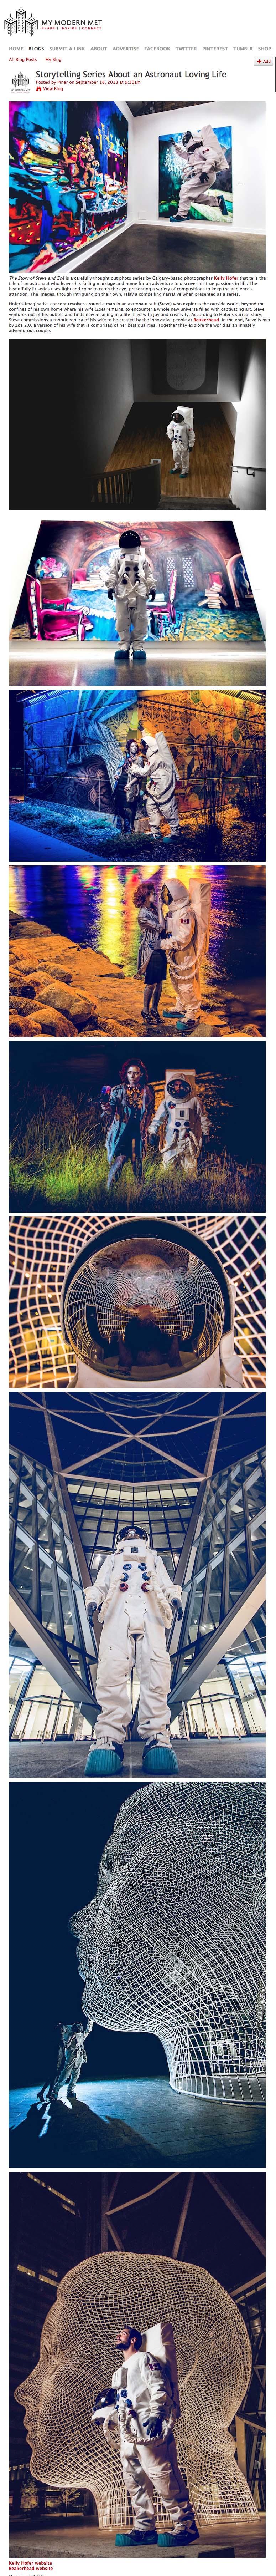 Storytelling Series About an Astronaut Loving Life - My Modern Metropolis copy.jpg